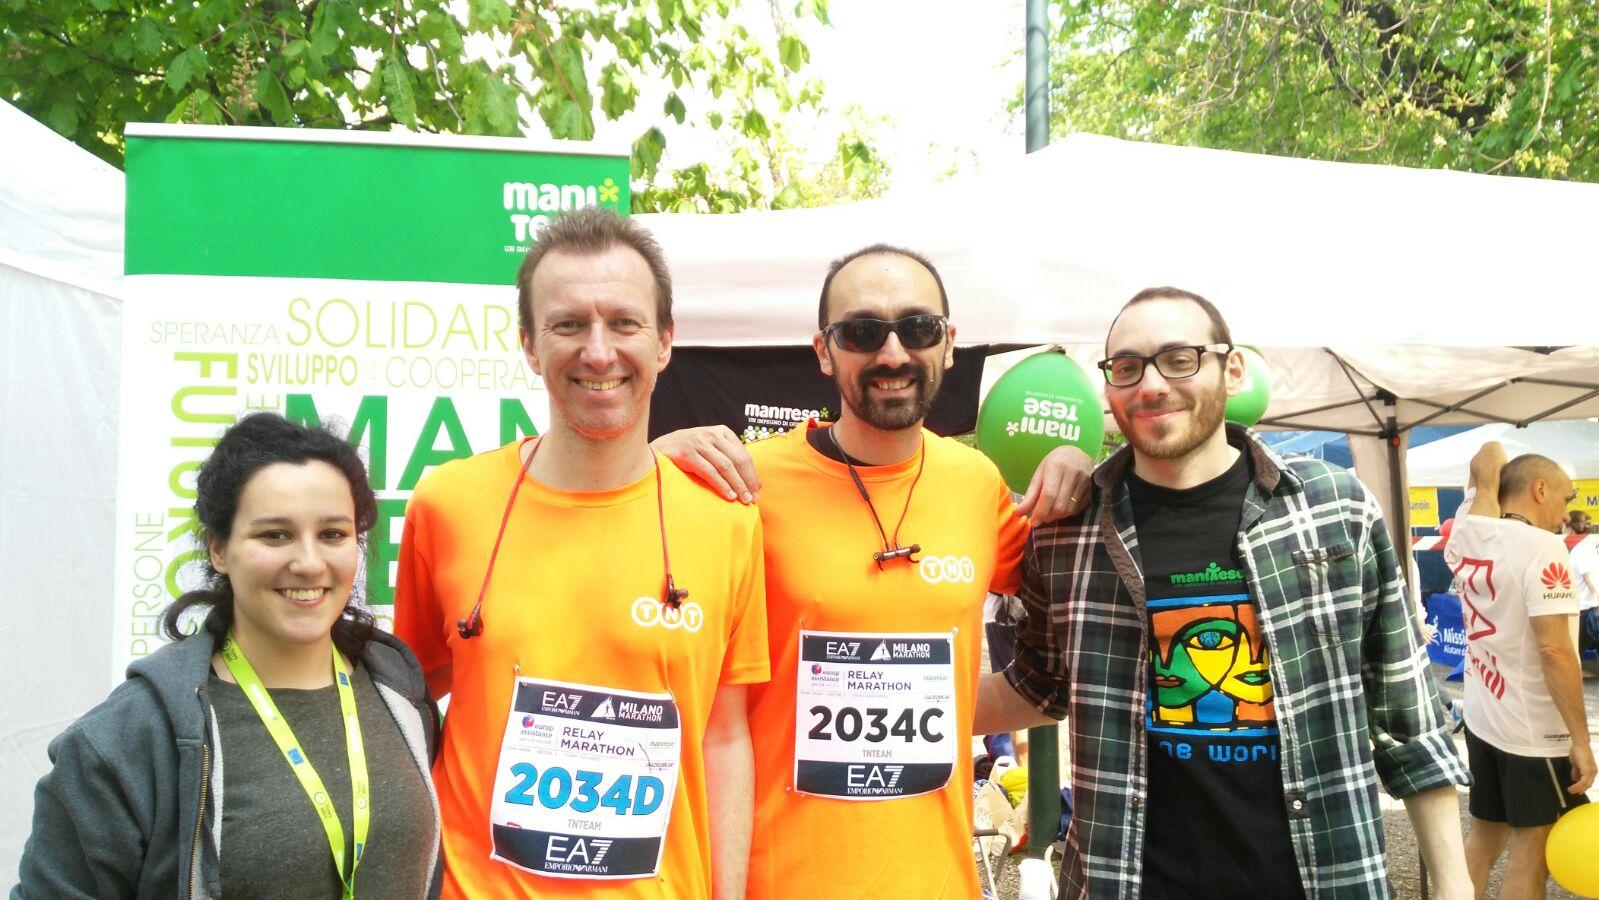 Milano Marathon_2_Mani_Tese_2017